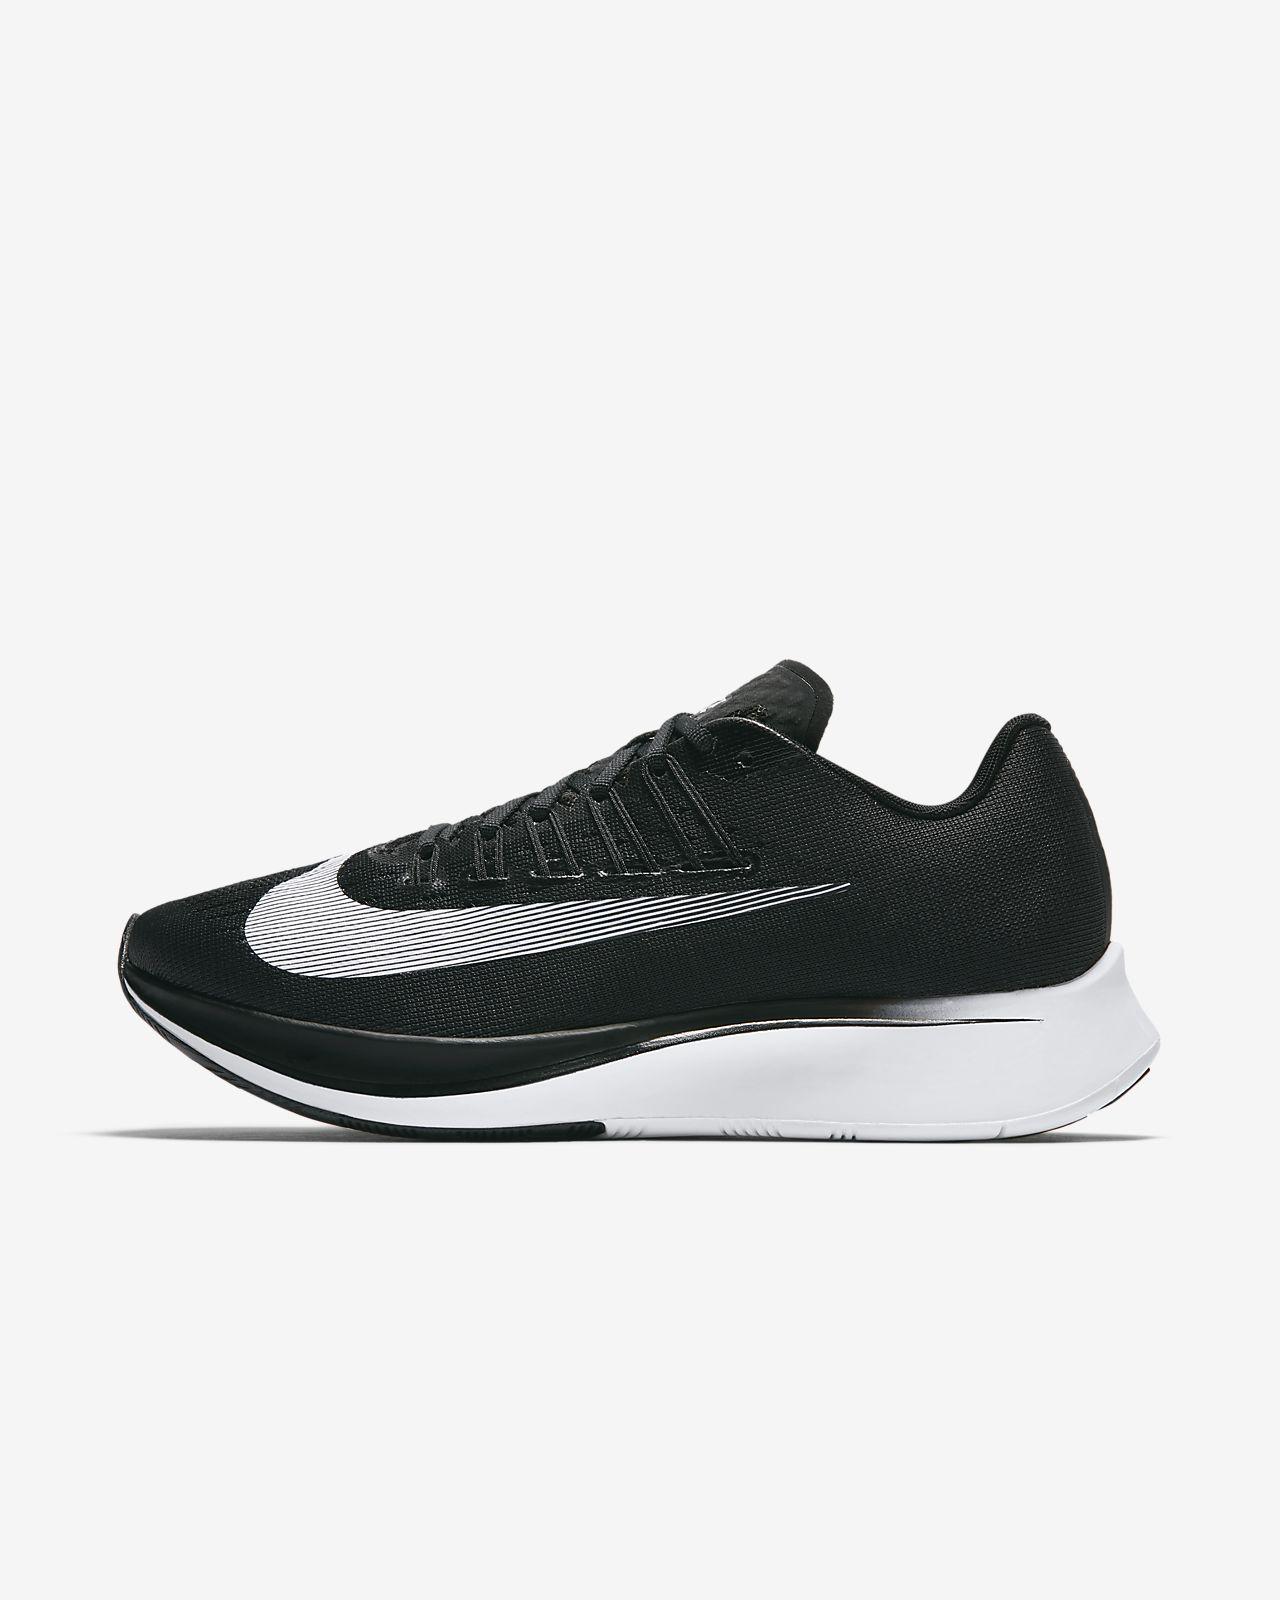 W Blazer Low ESS, Zapatos de Baloncesto para Mujer, Negro (Black/Black-Black 001), 37.5 EU Nike